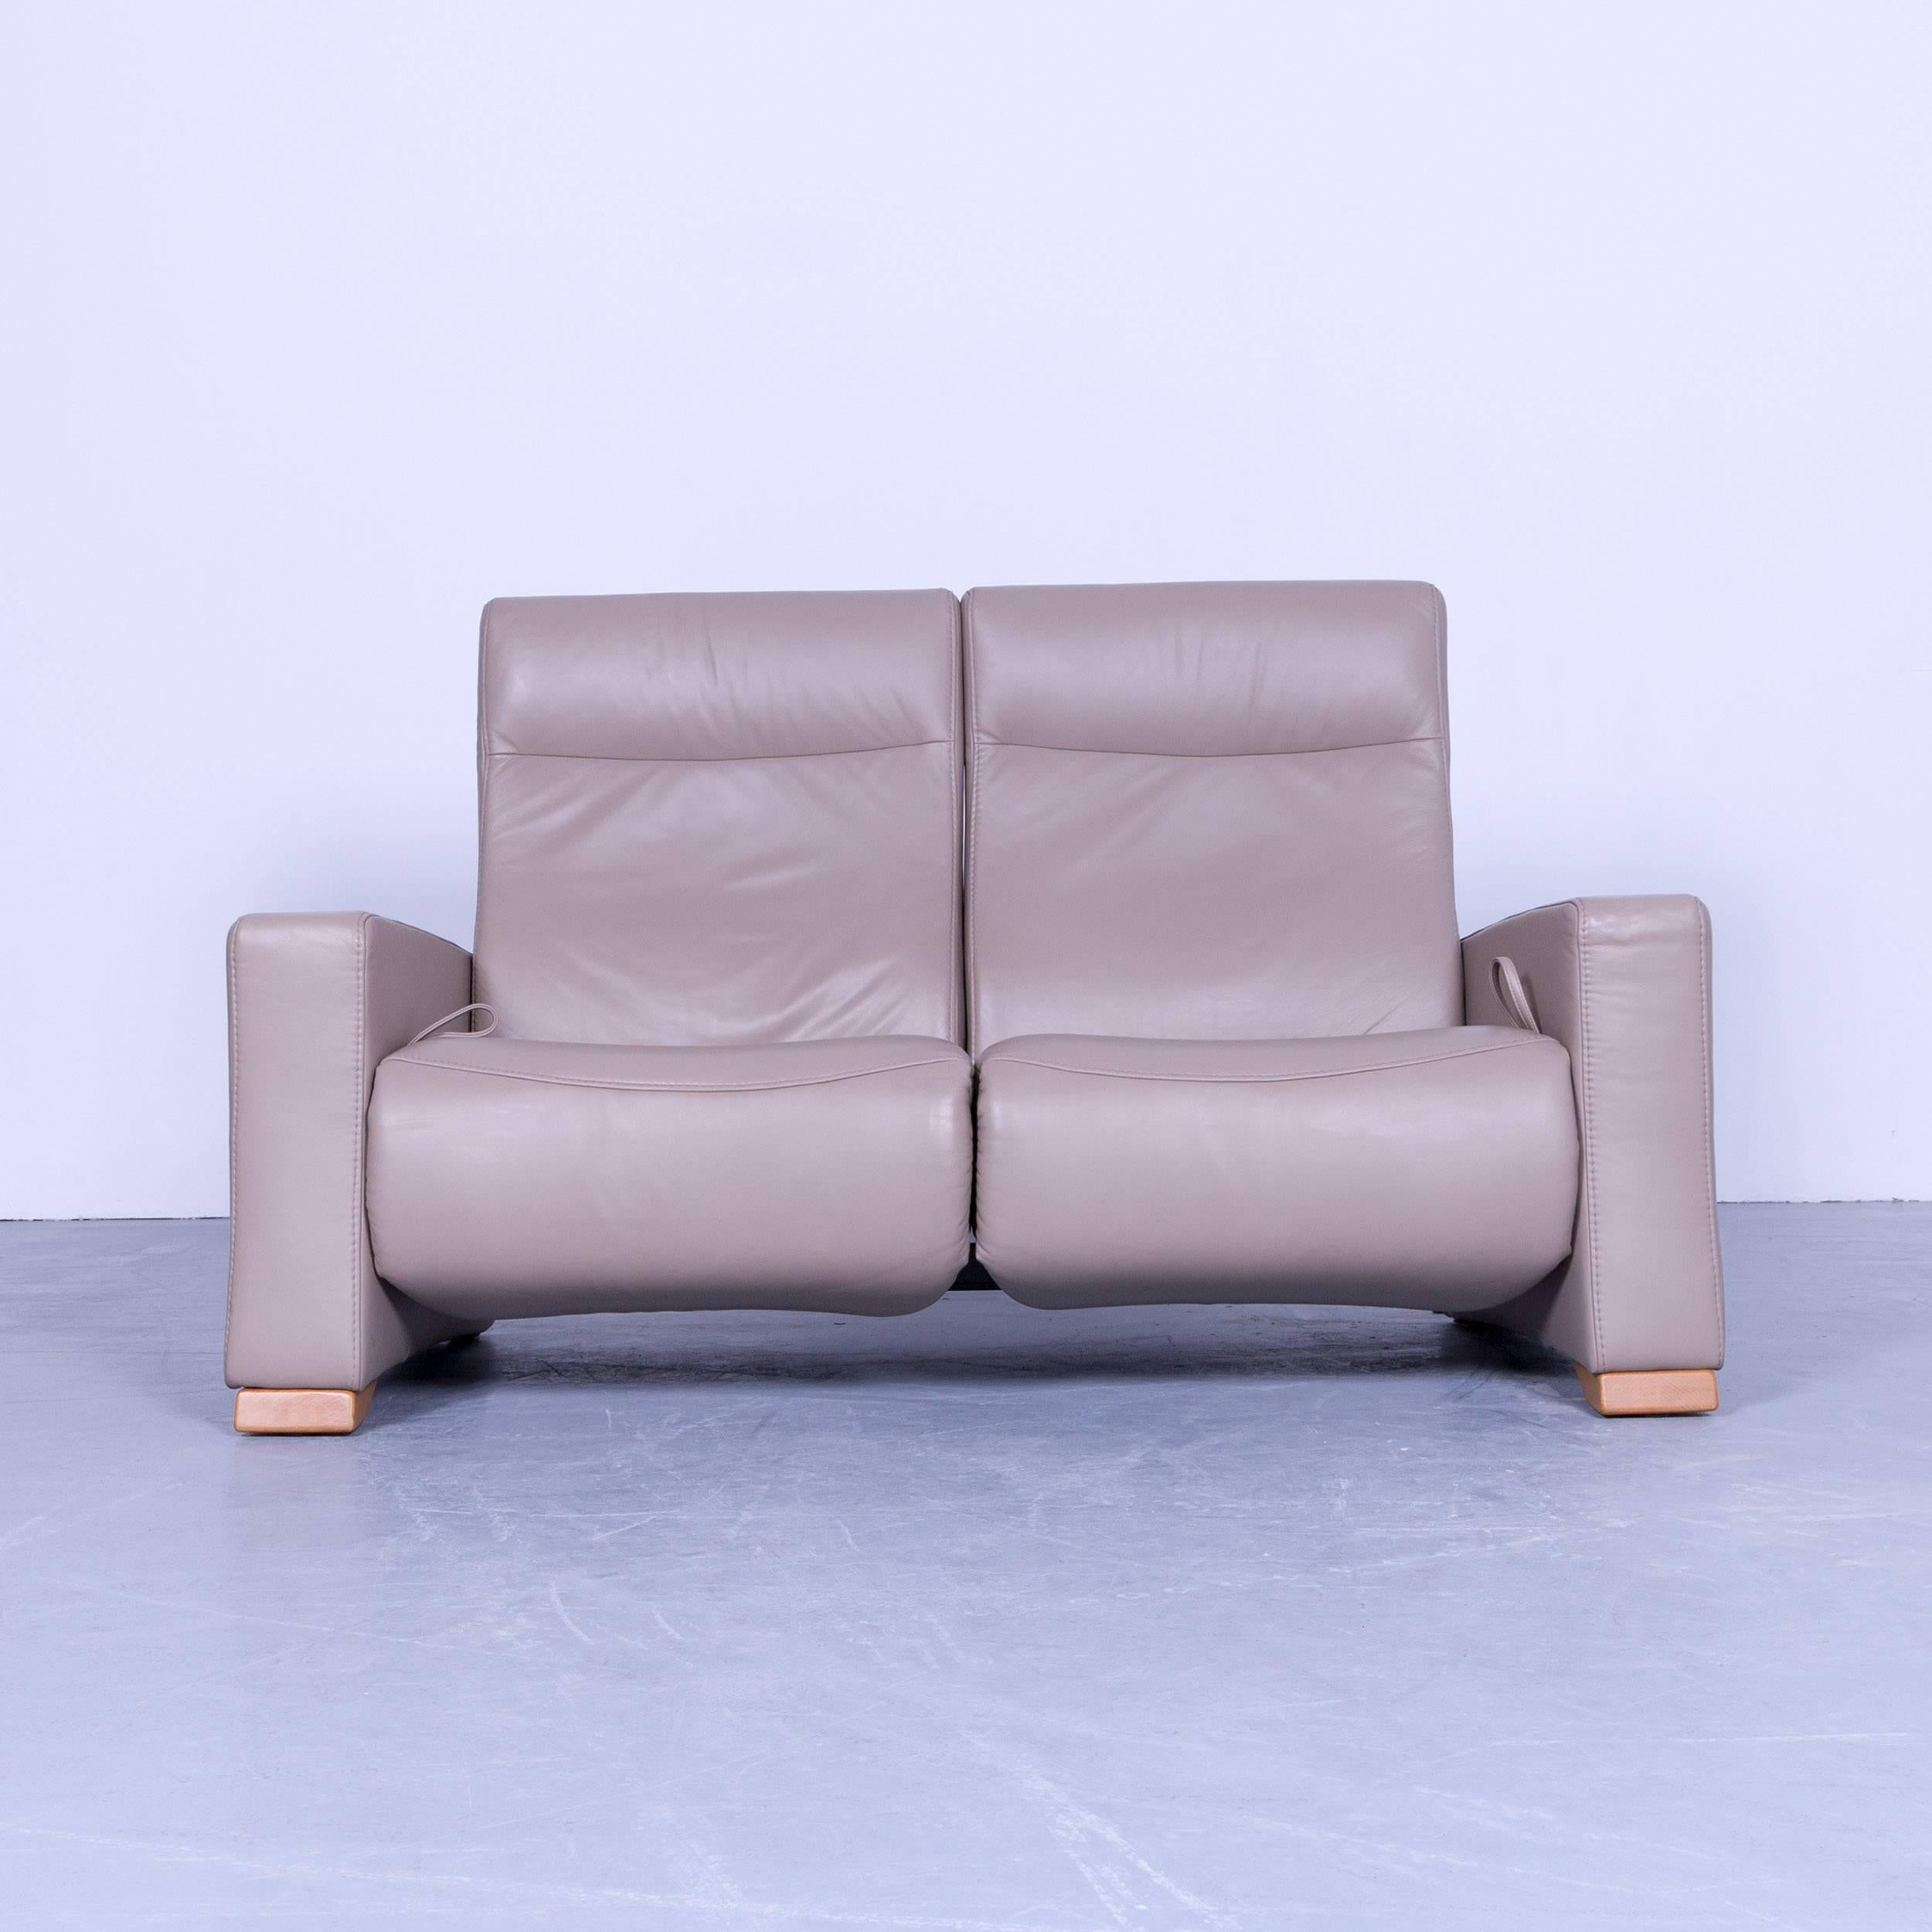 Sofa Mit Funktion Design Schlafsofa Barclays Anthrazit Cm